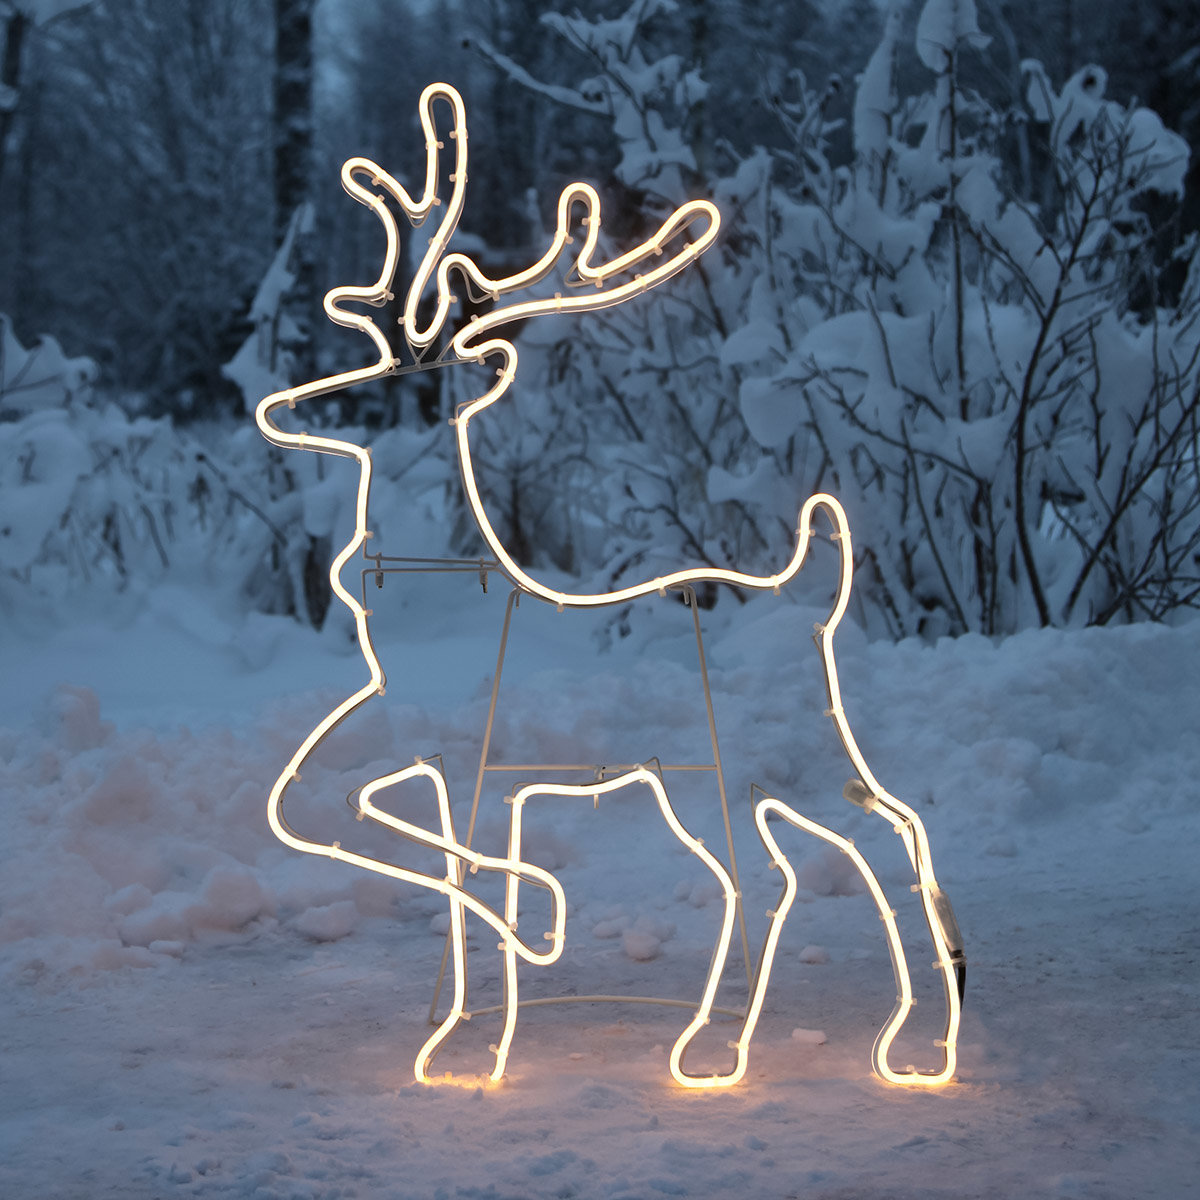 LED-Rentier-Silhouette Polaris | #2